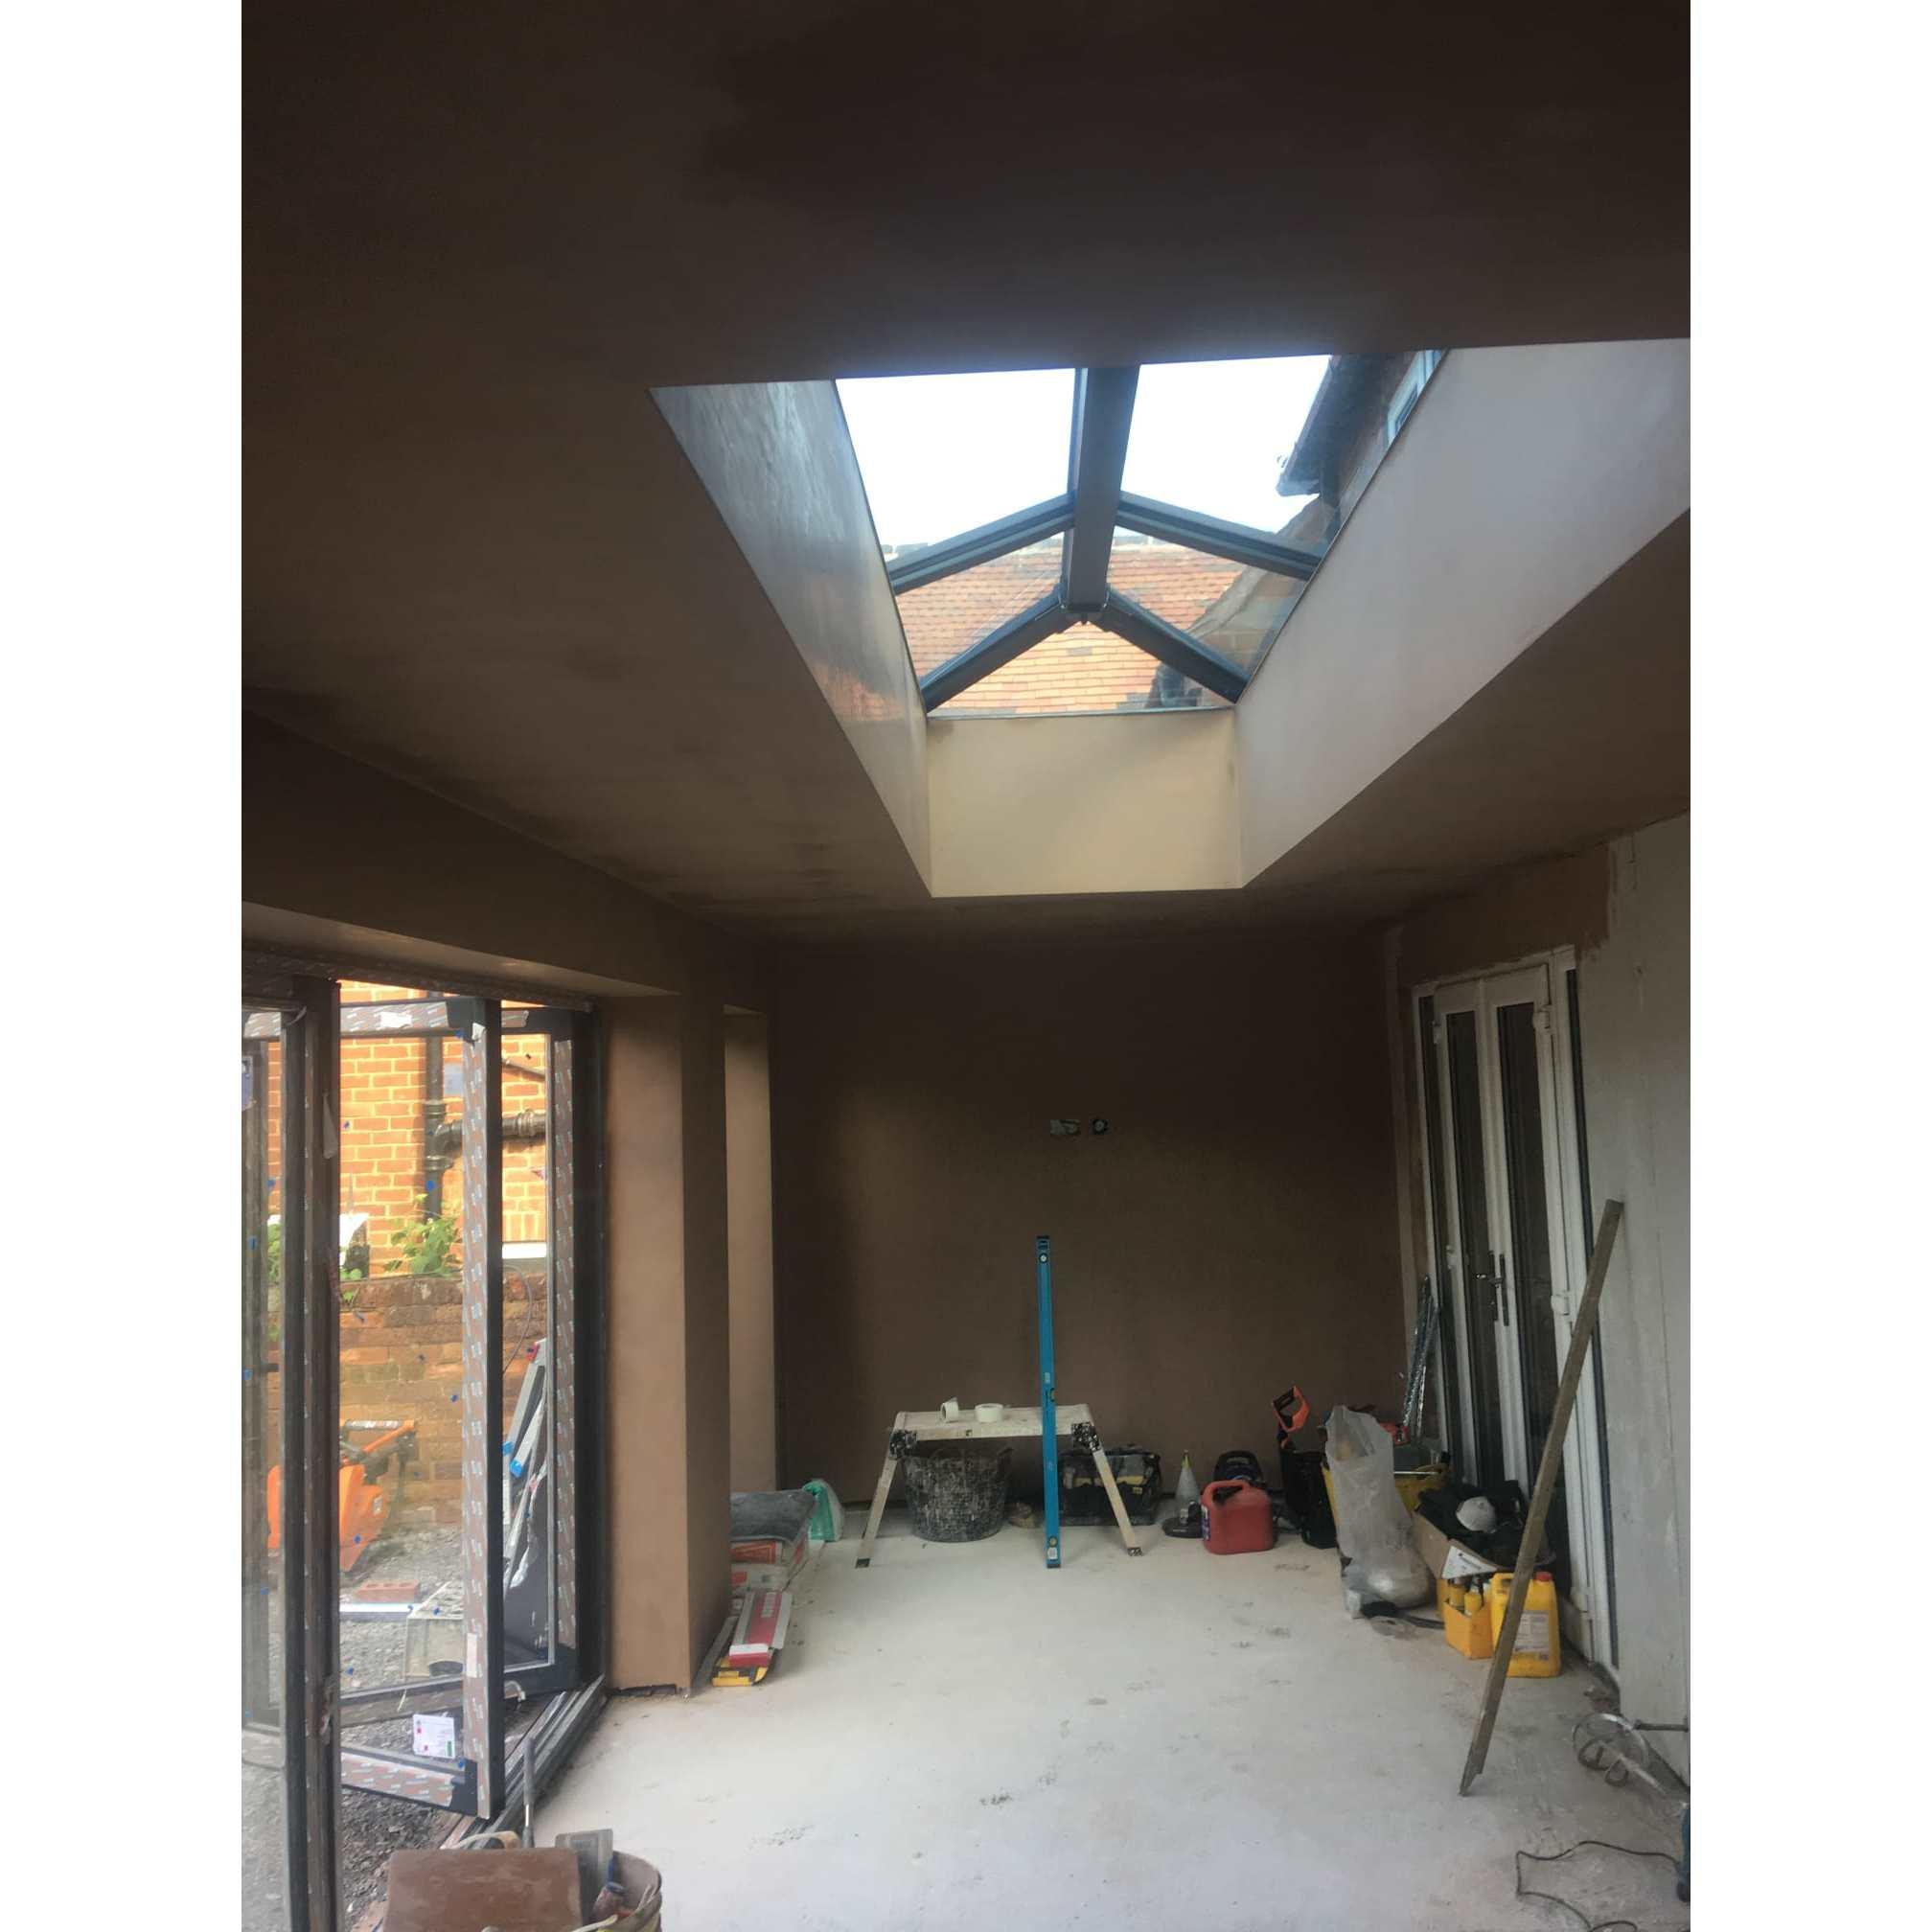 S.N.G Plastering, Rendering & Property Maintenance - Wolverhampton, Staffordshire WV5 0ER - 07563 079791 | ShowMeLocal.com